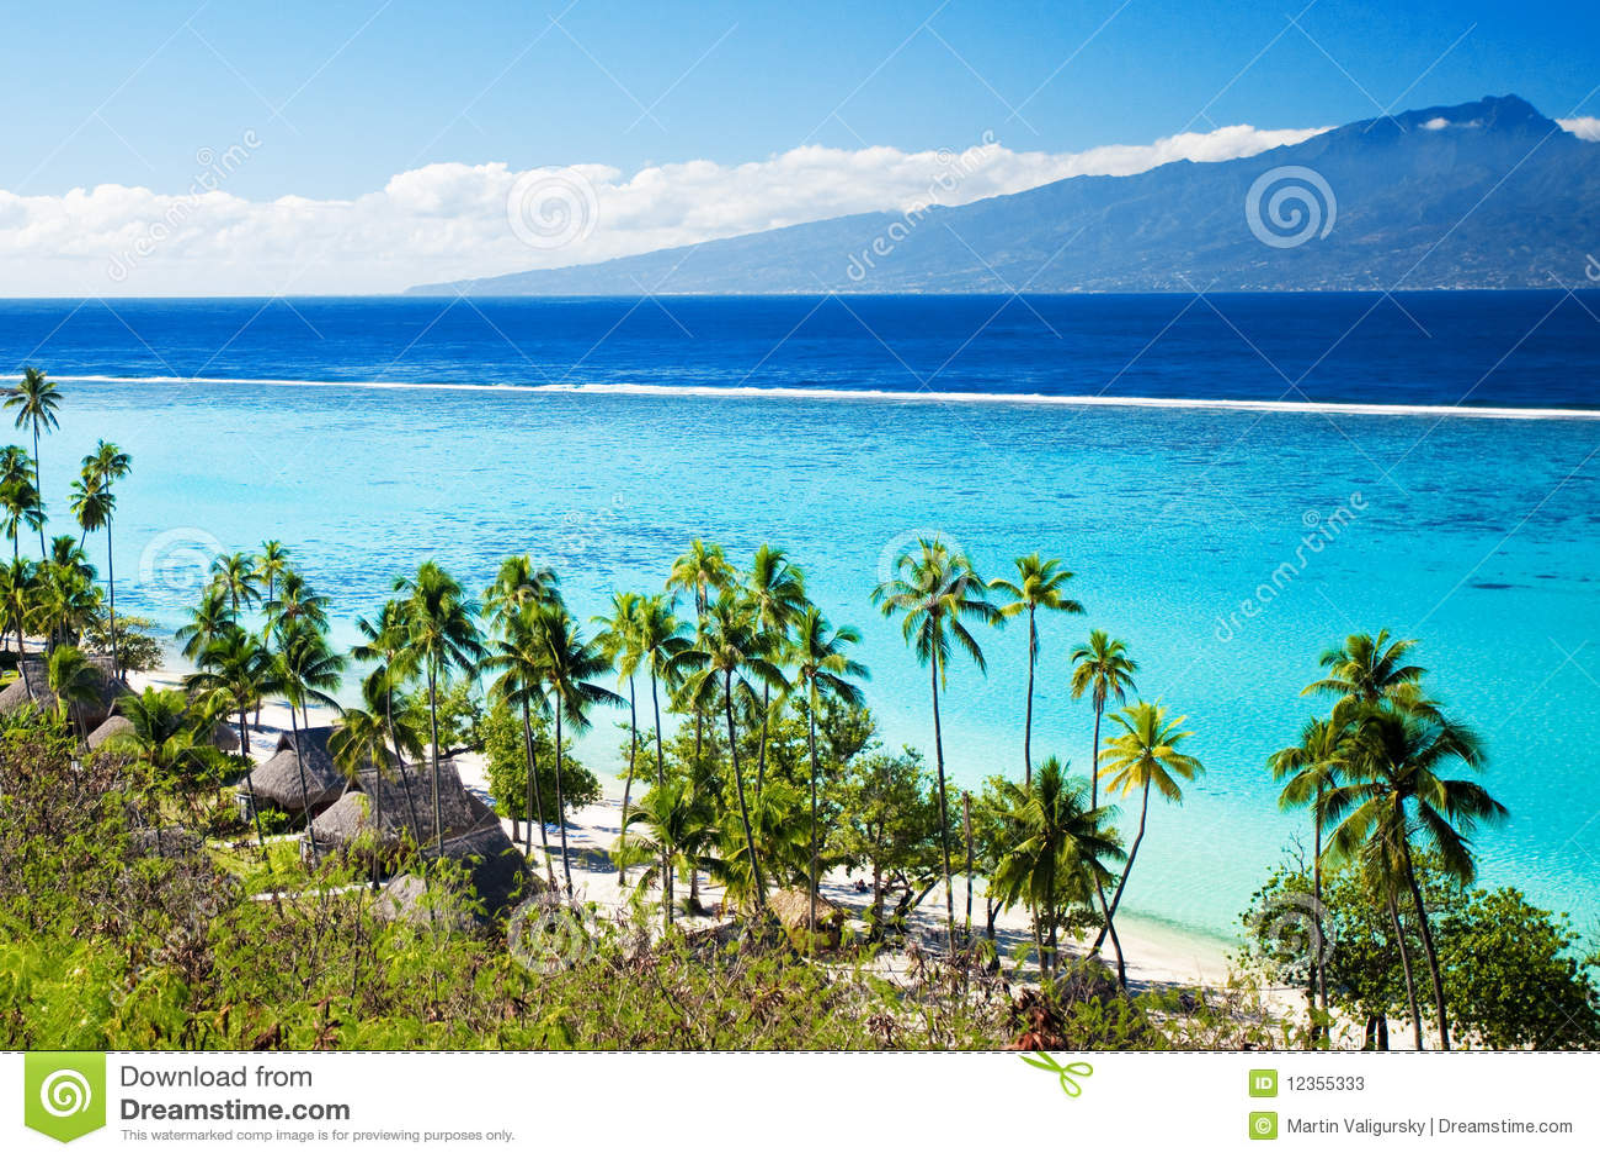 Palmeiras na praia tropical em tahiti